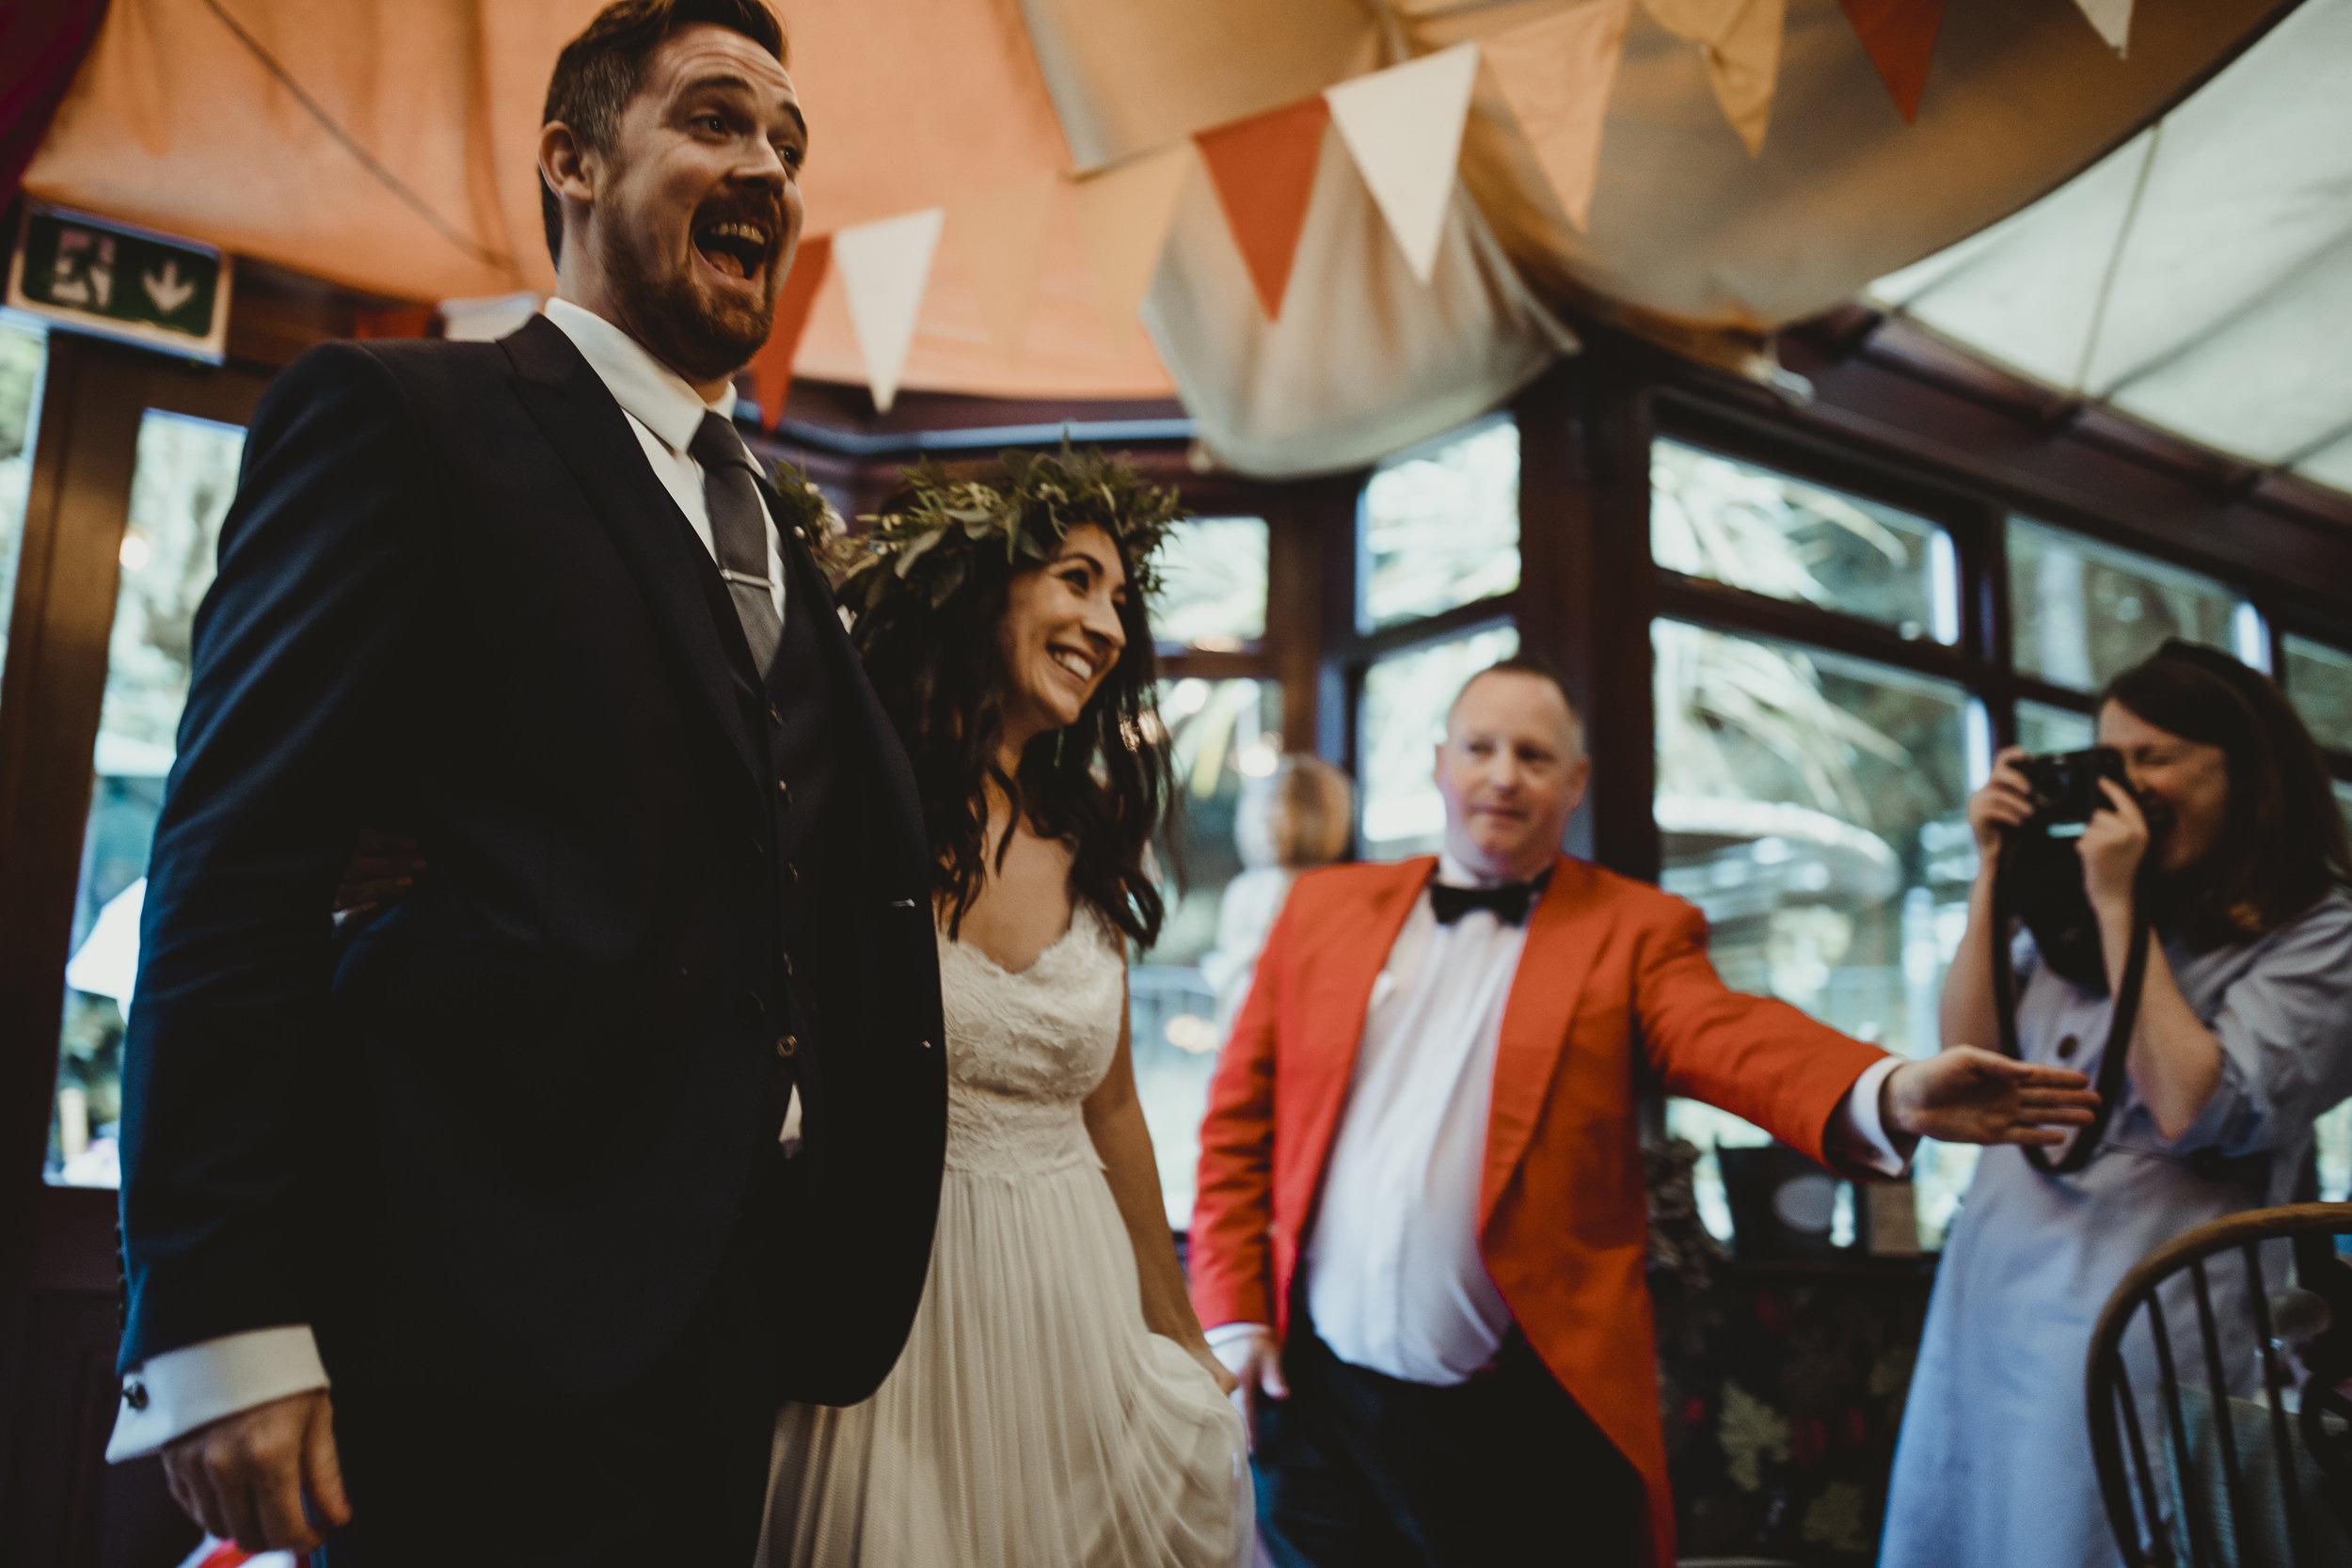 N&J_YORKSHIRE_WEDDING_PHOTOGRAPHER_MALTON_LEEDS_SHEFFIELD-640.JPG